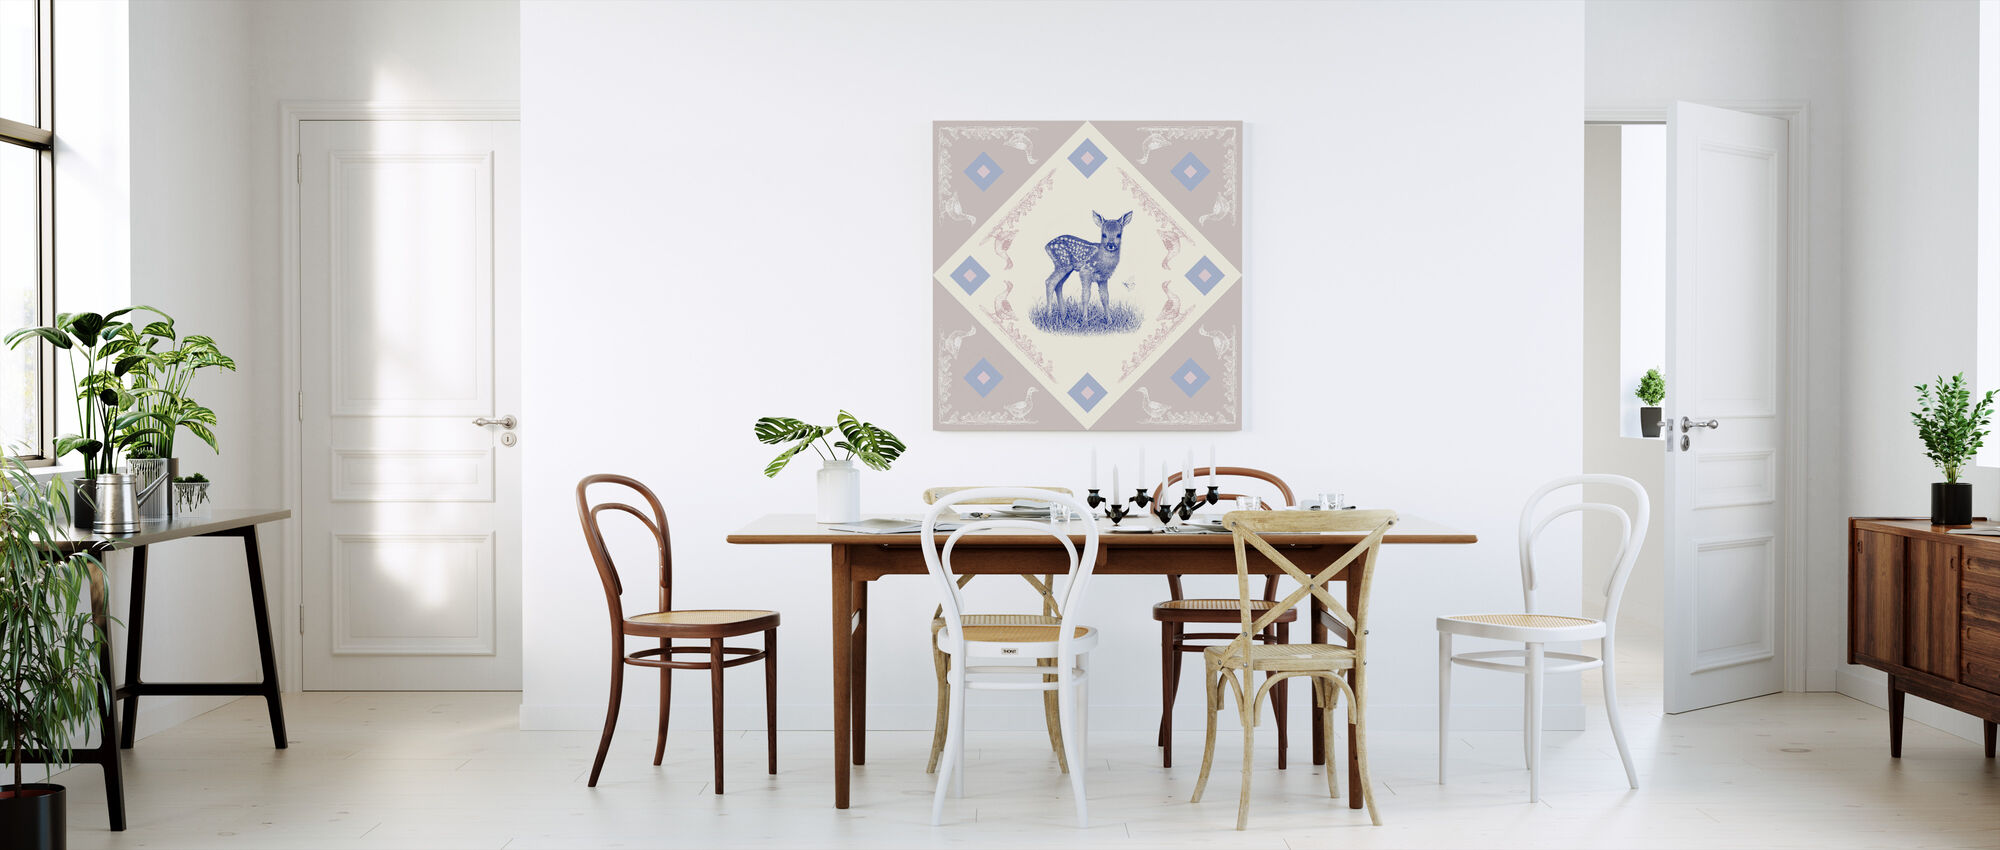 Hjort, Blå Rosa - Canvastavla - Kök